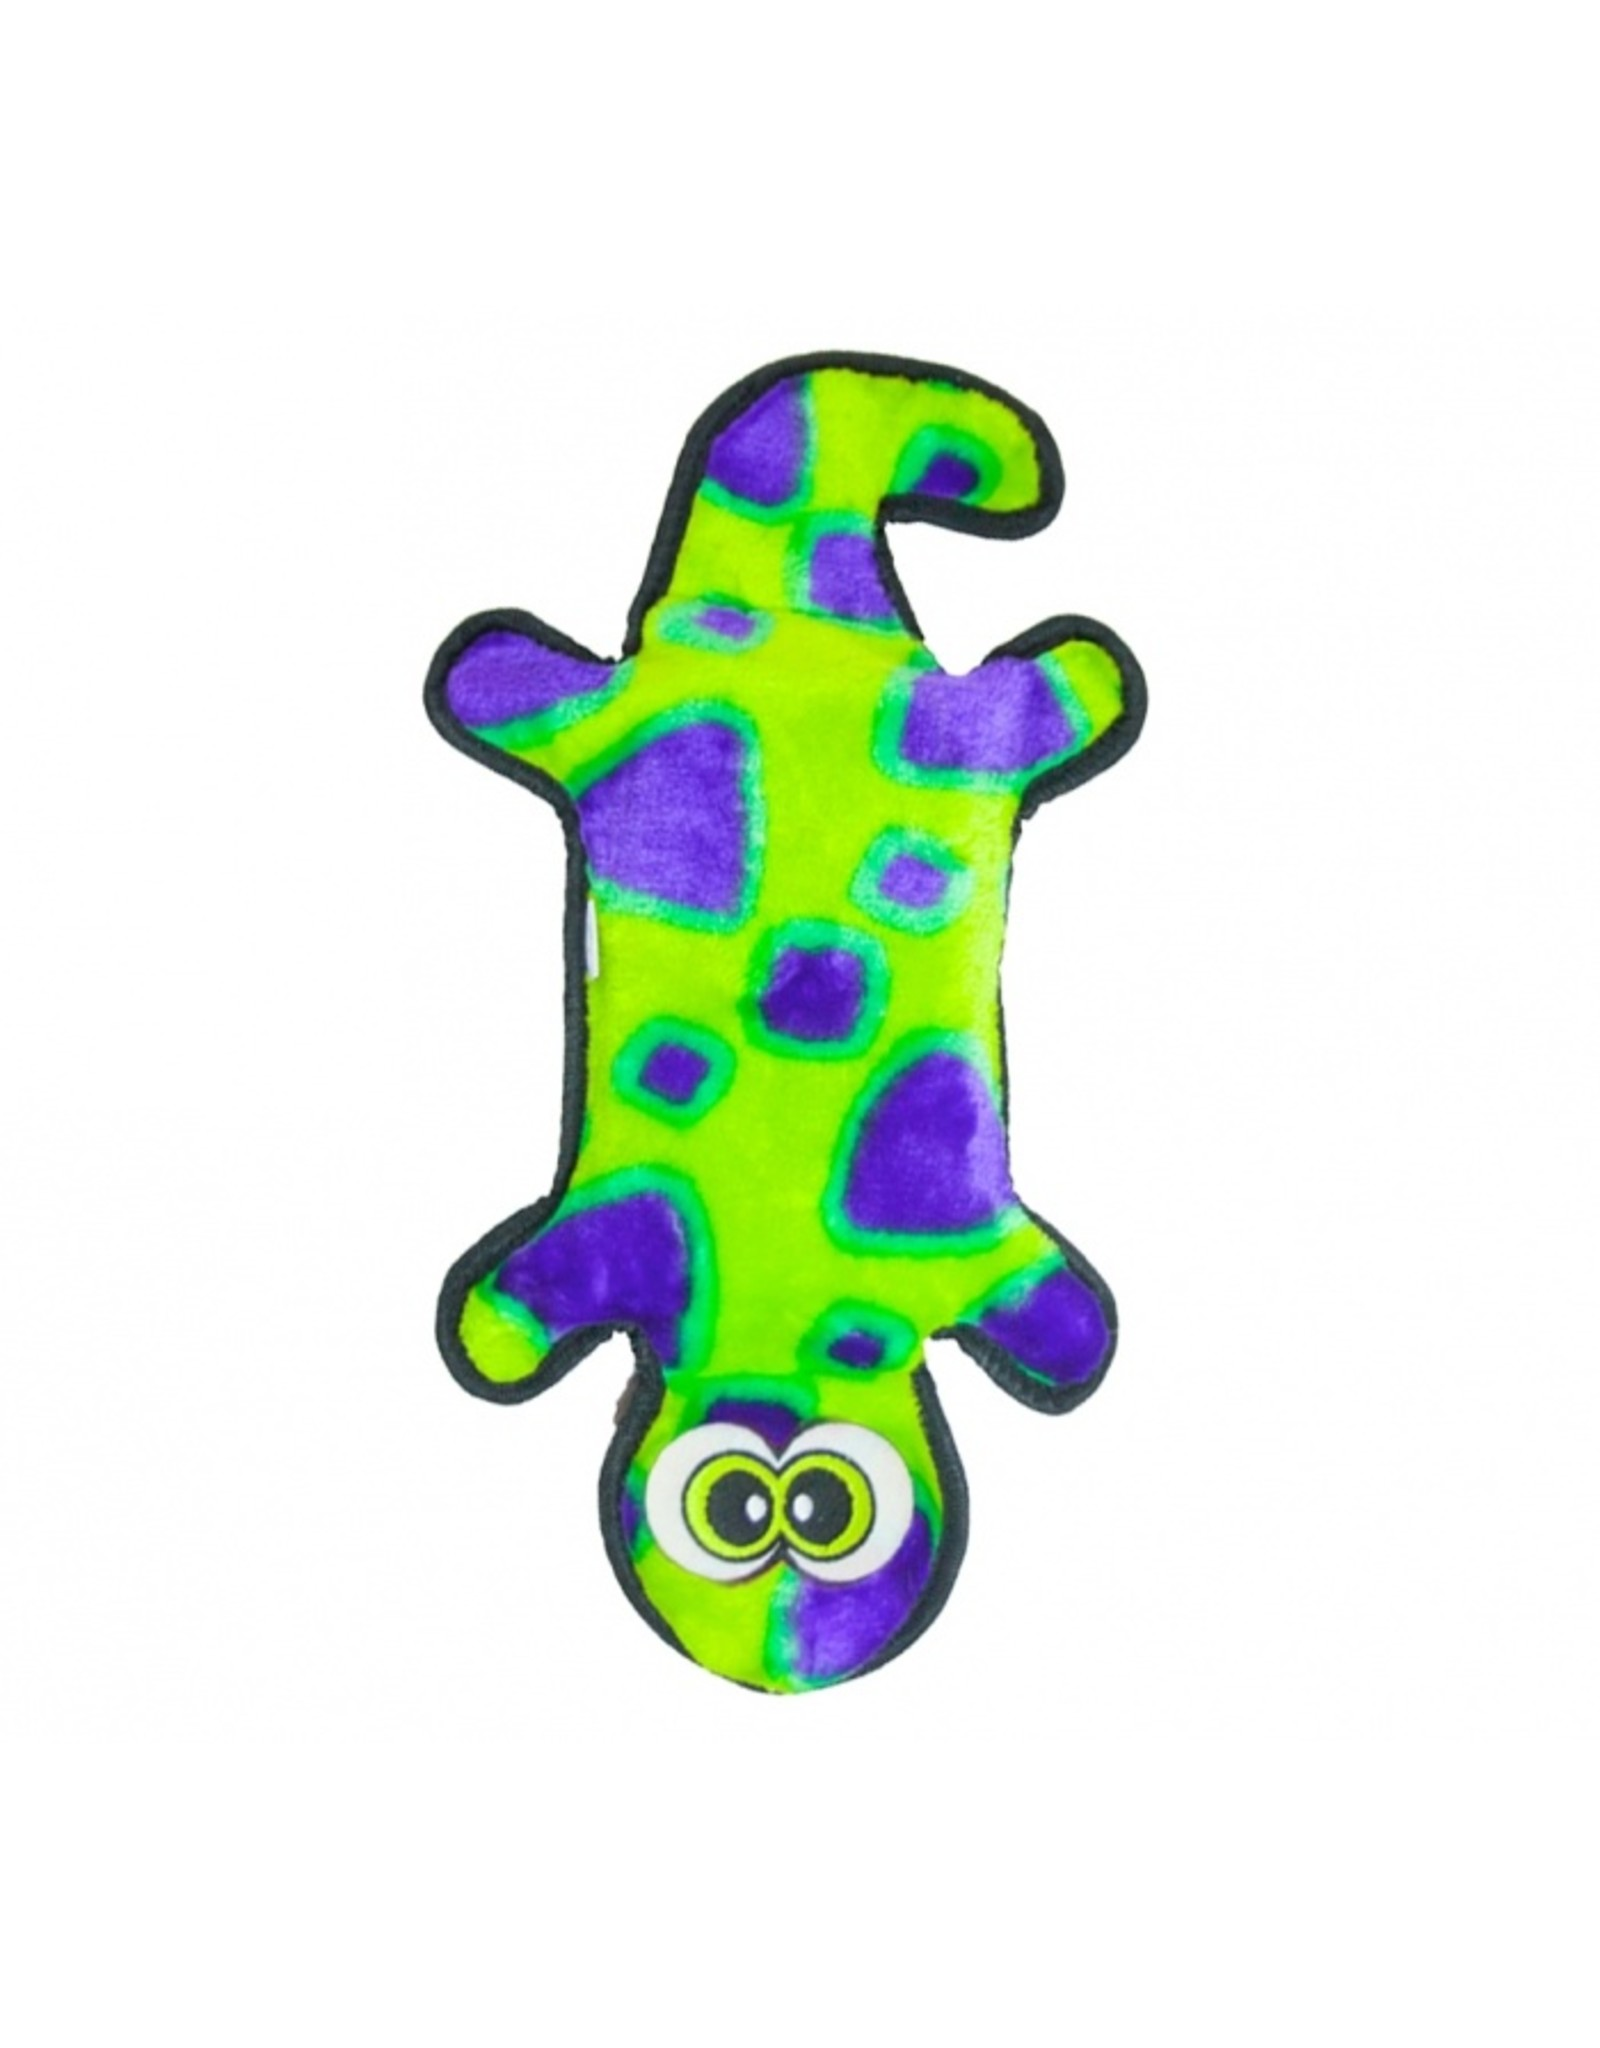 Outward Hound Outward Hound: Gecko Yellow Green LG